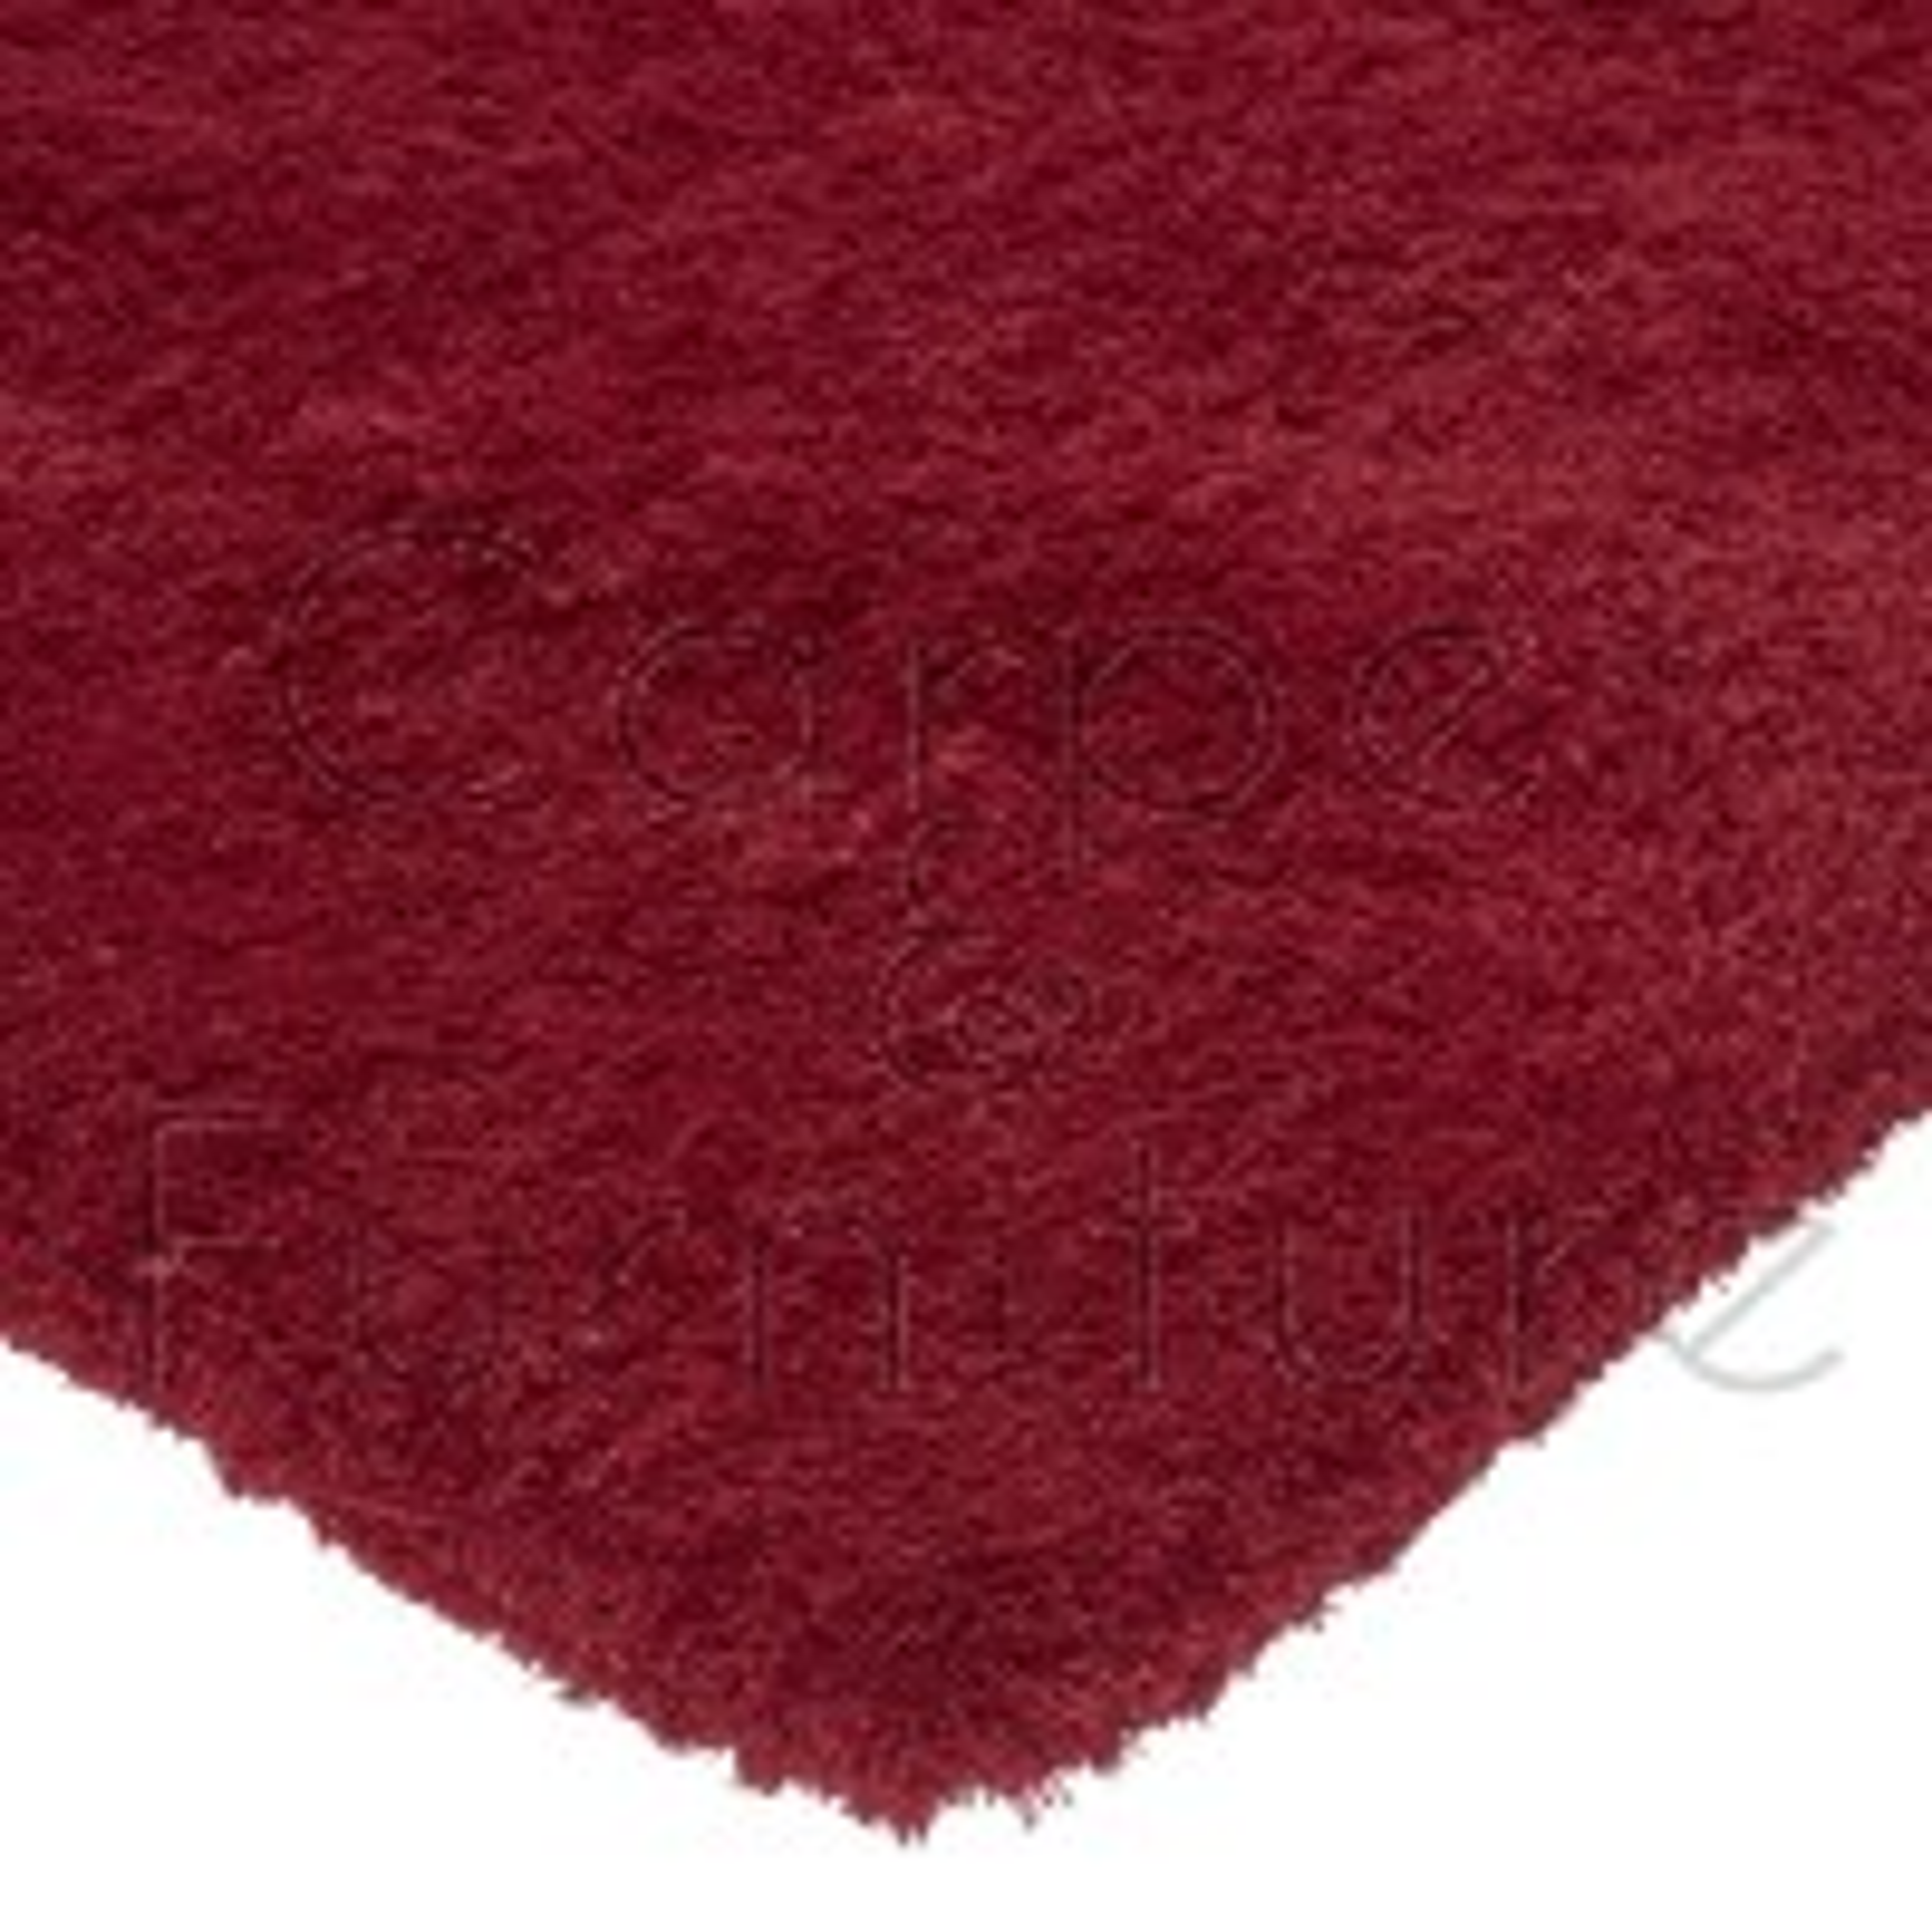 "Lulu Shaggy Rug - Sorbet Red - Size 80 x 150 cm (2'8"" x 5')"